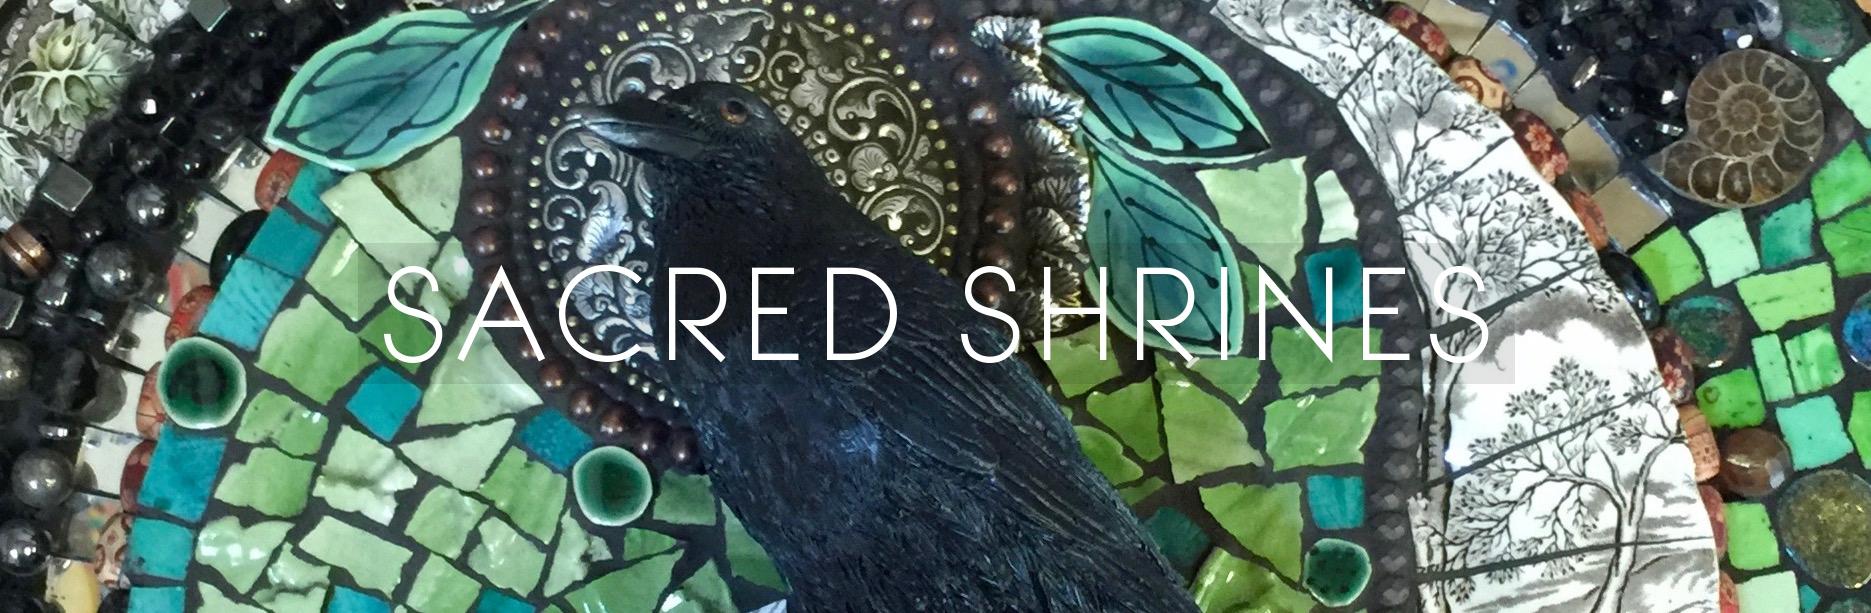 sacred shrines mosaics